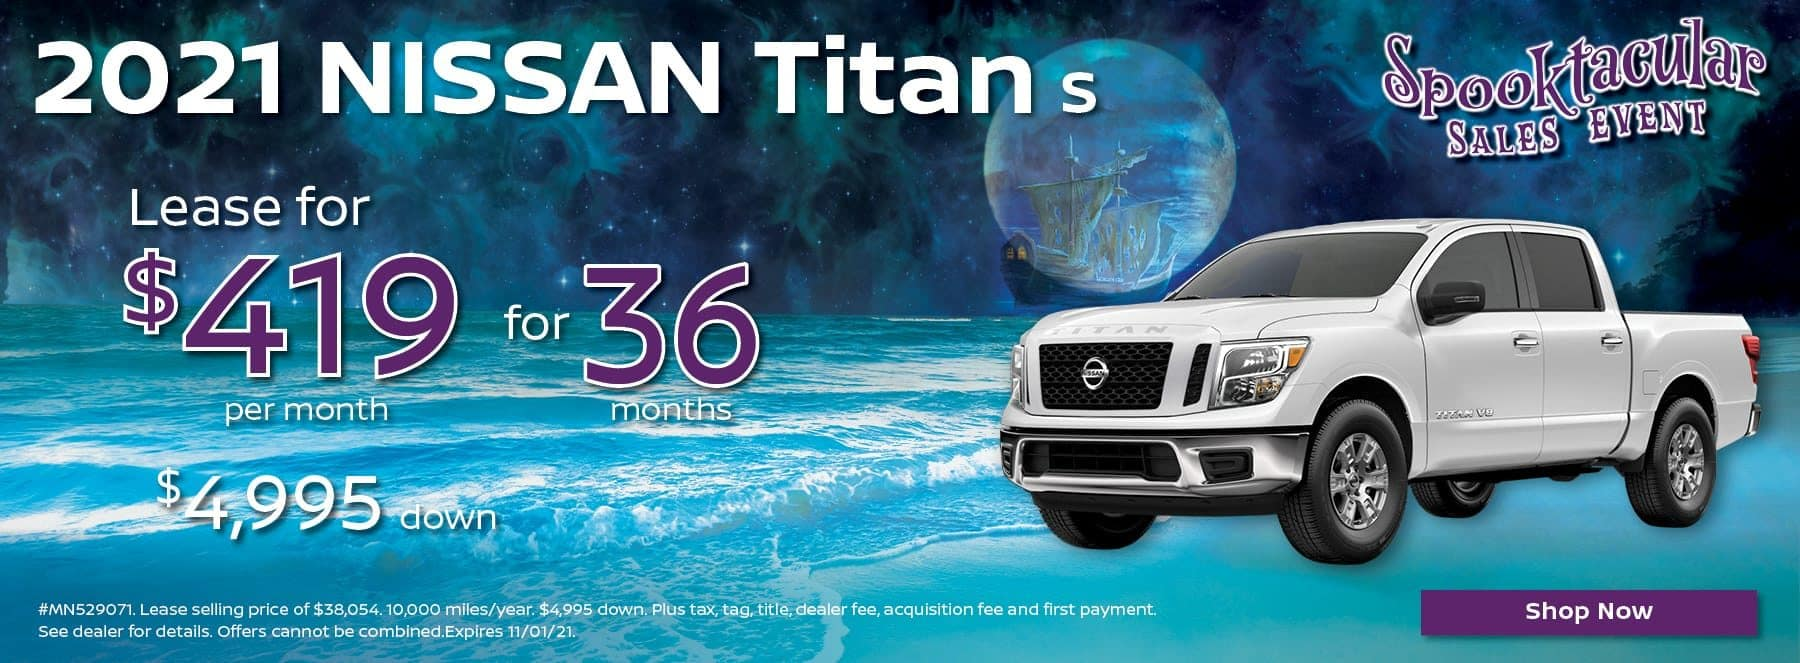 21 Titan 419